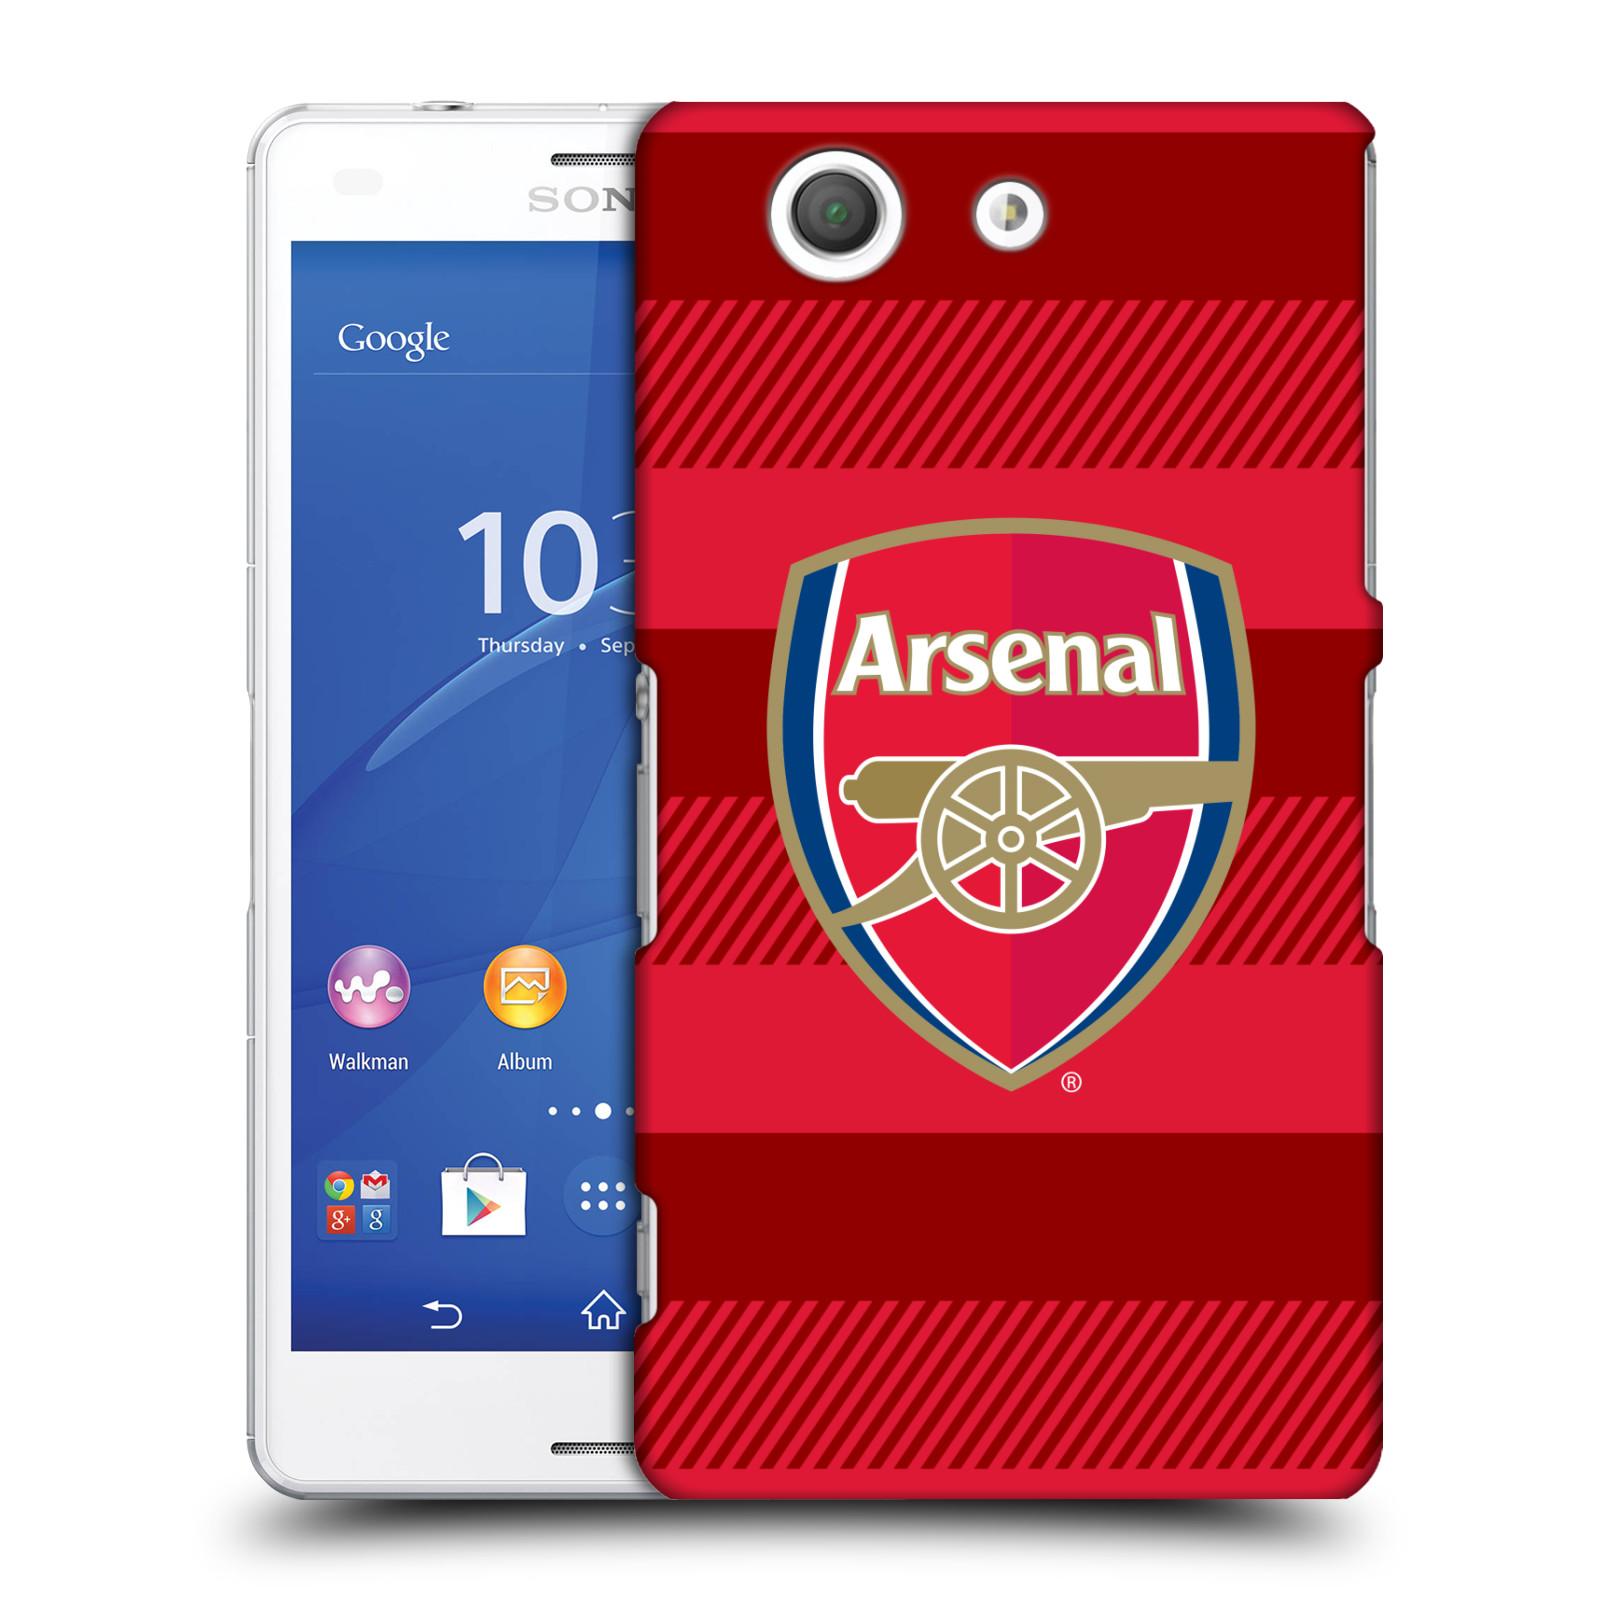 Plastové pouzdro na mobil Sony Xperia Z3 Compact D5803 - Head Case - Arsenal FC - Logo s pruhy